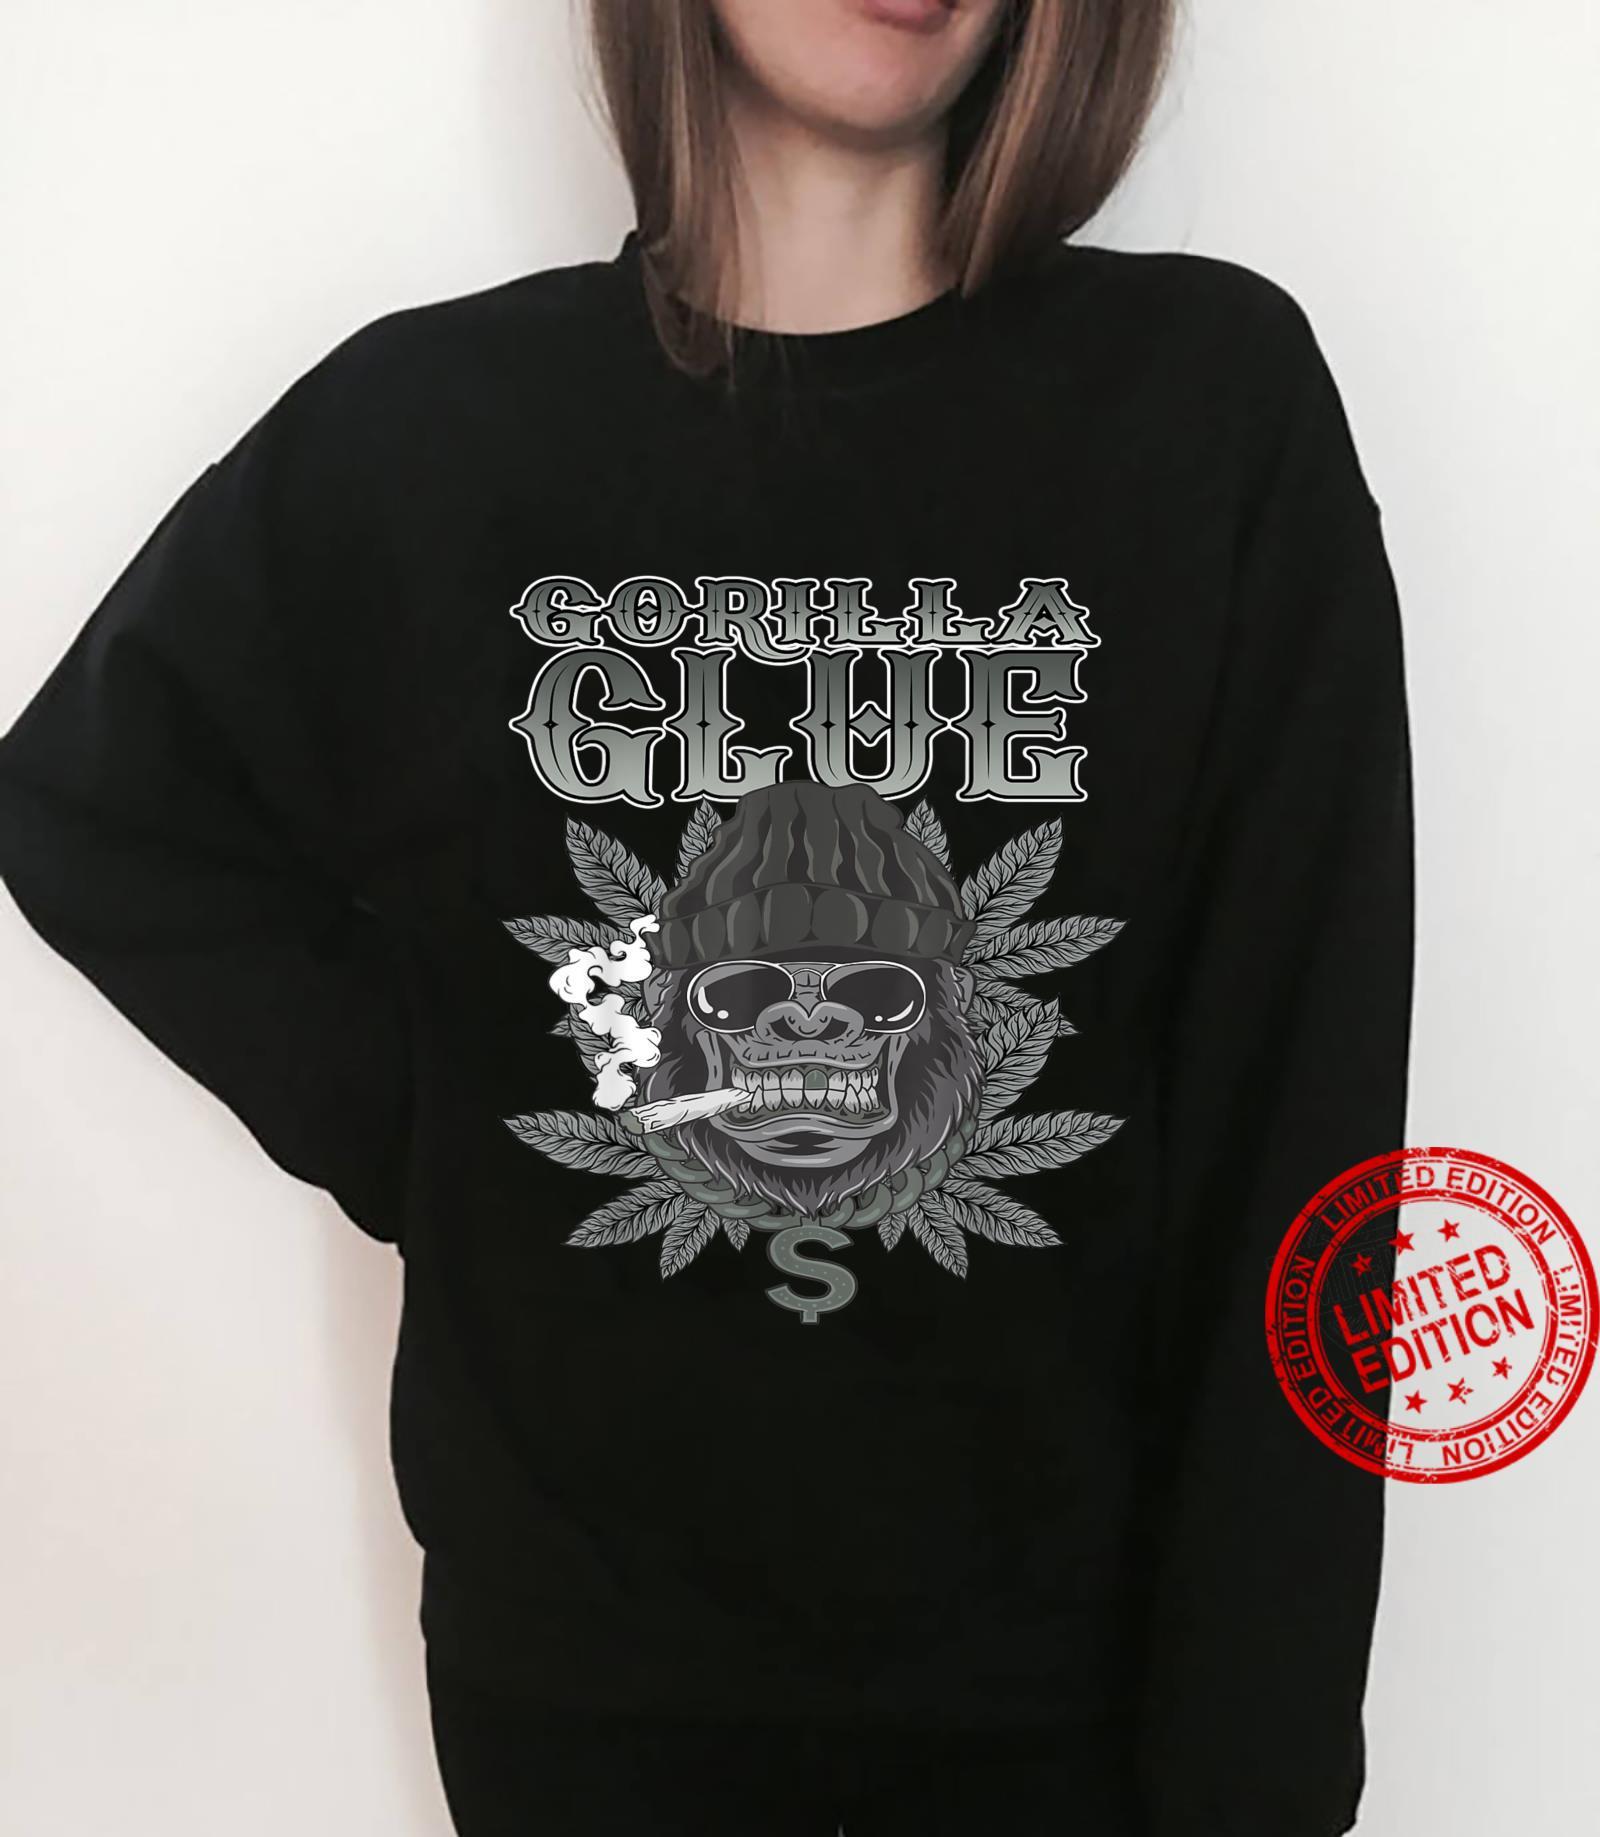 Gorillas Glue Strain Marijuana Glue Hybrid Shirt sweater